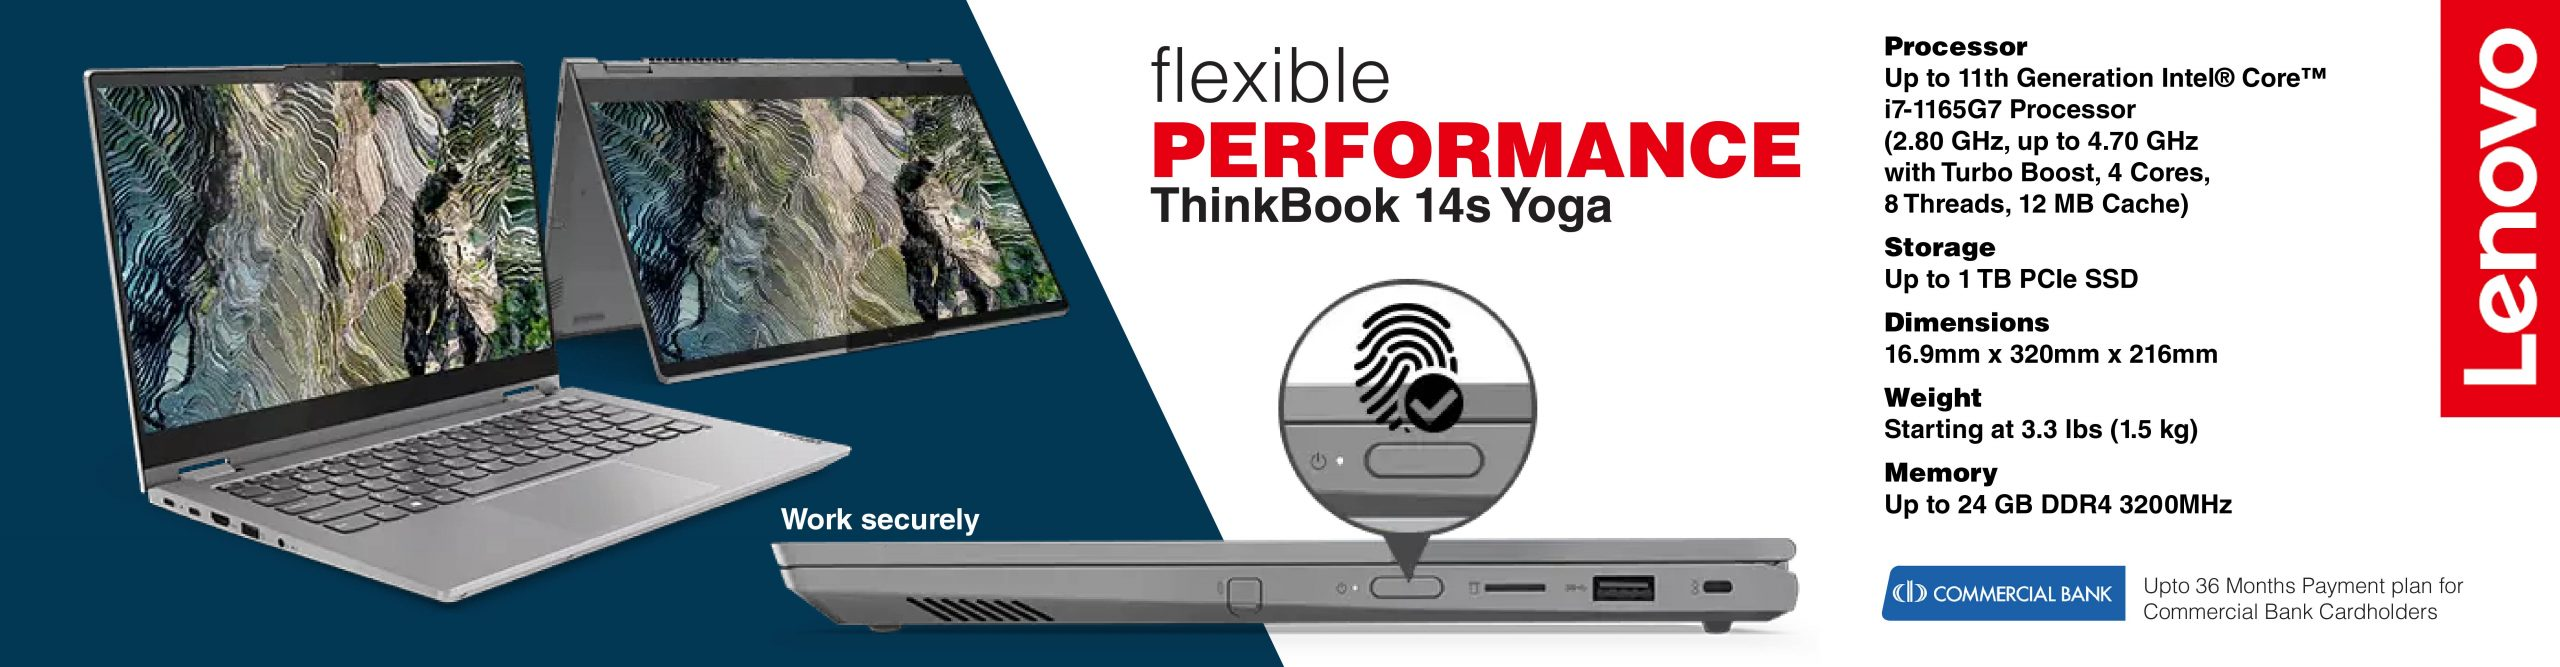 FT-009-ThinkBook 14s Yoga-01